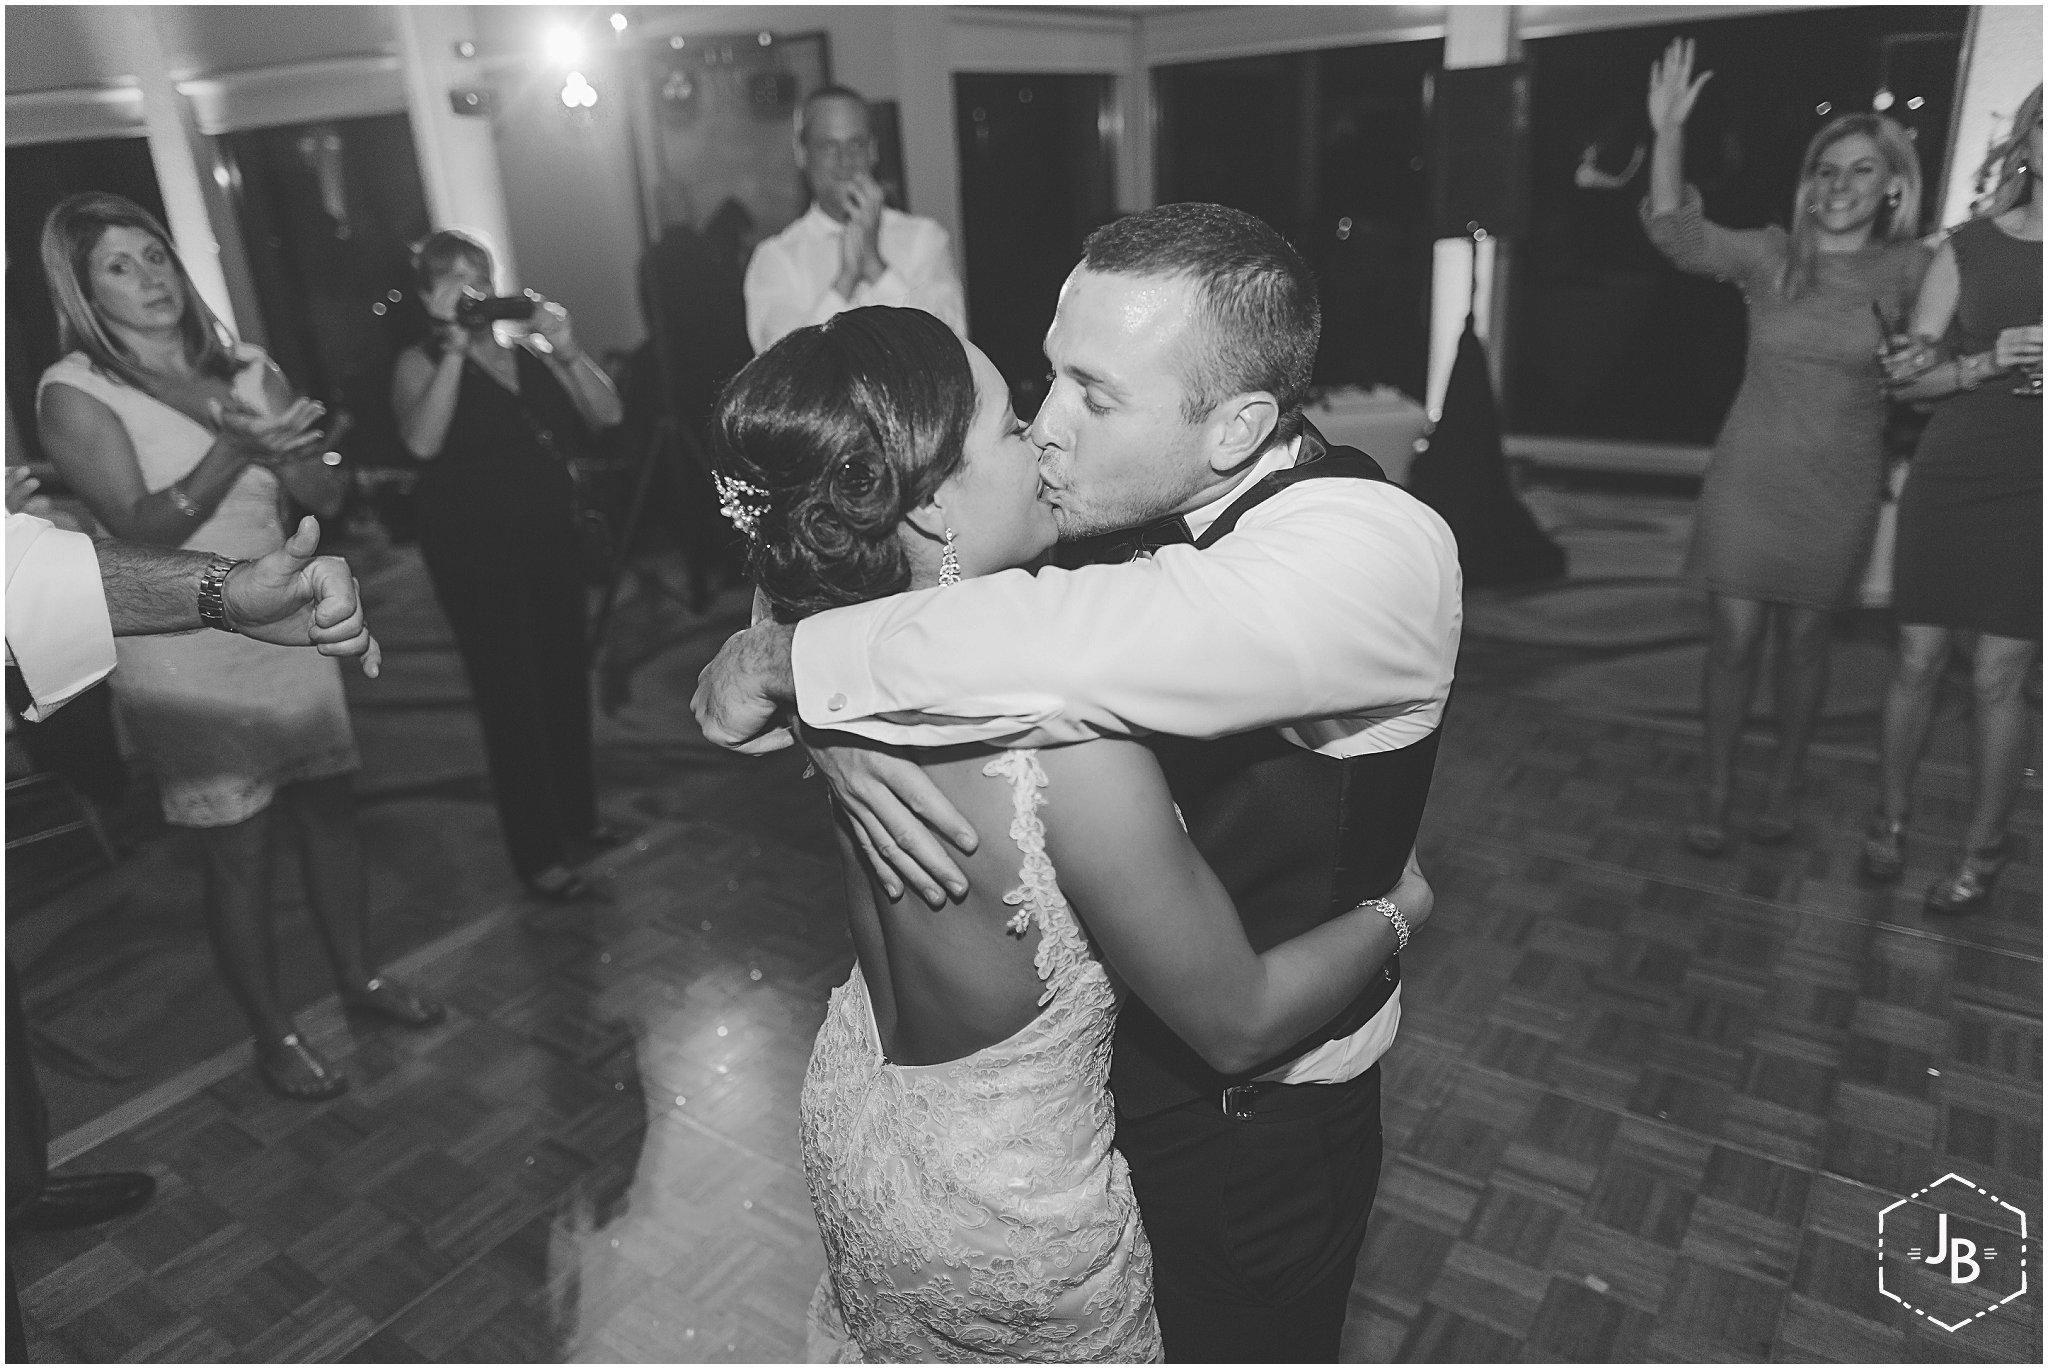 WeddingandEngagementFloridaPhotographer_0283.jpg